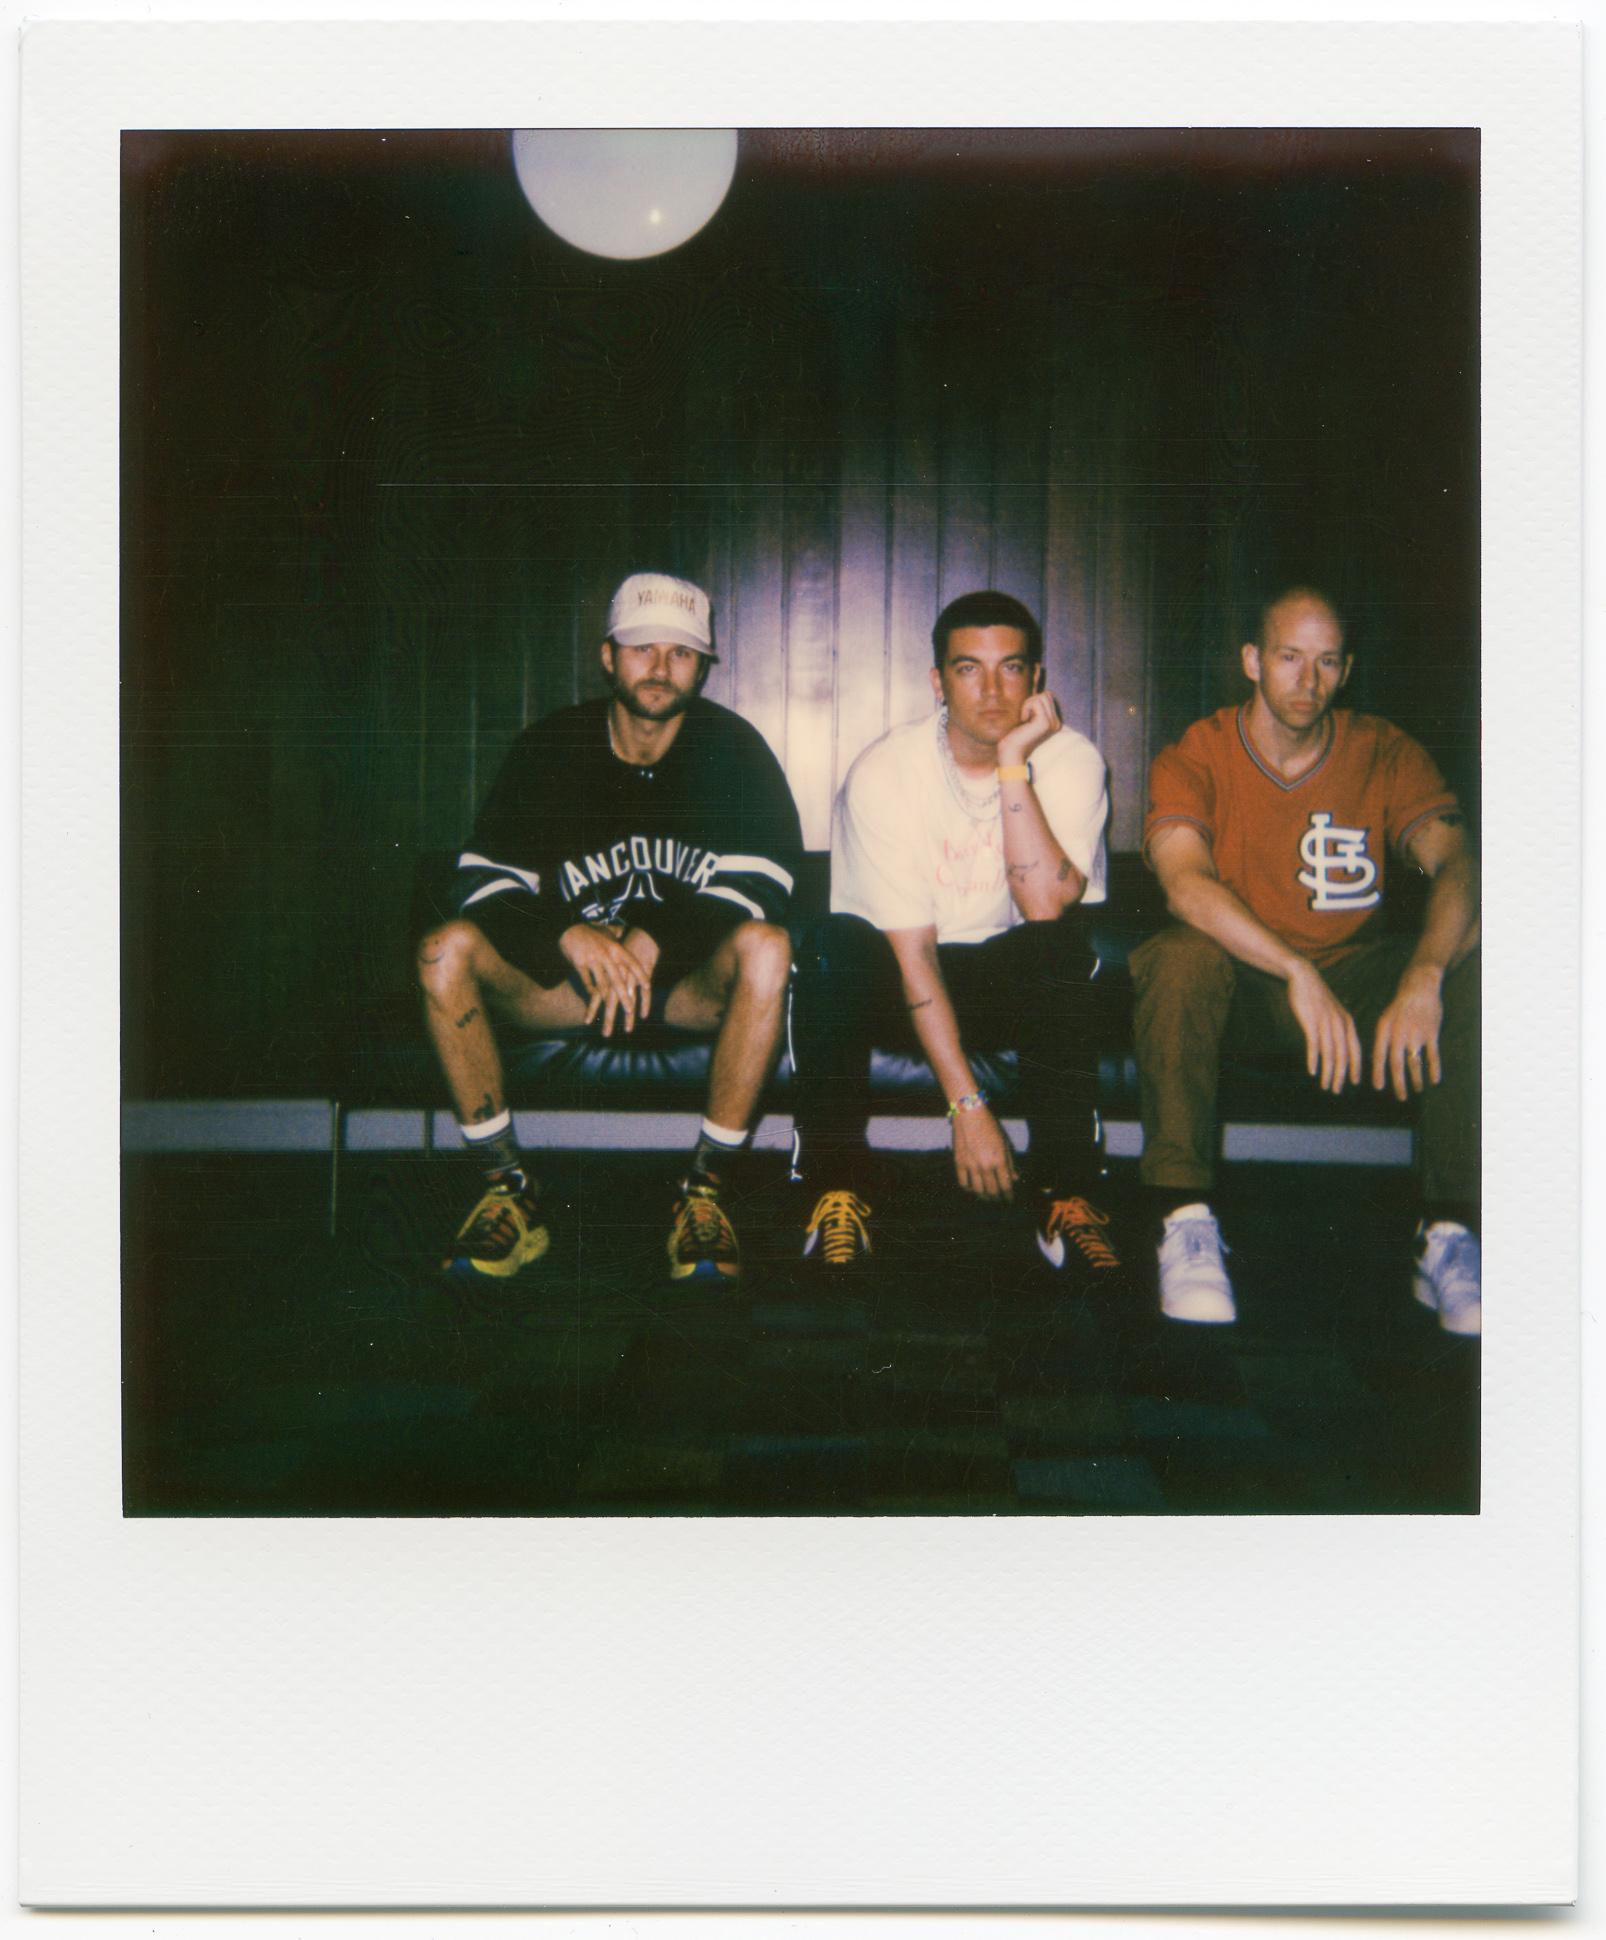 LANY-Polaroid-17-06-2019-Vancouver-5.jpg